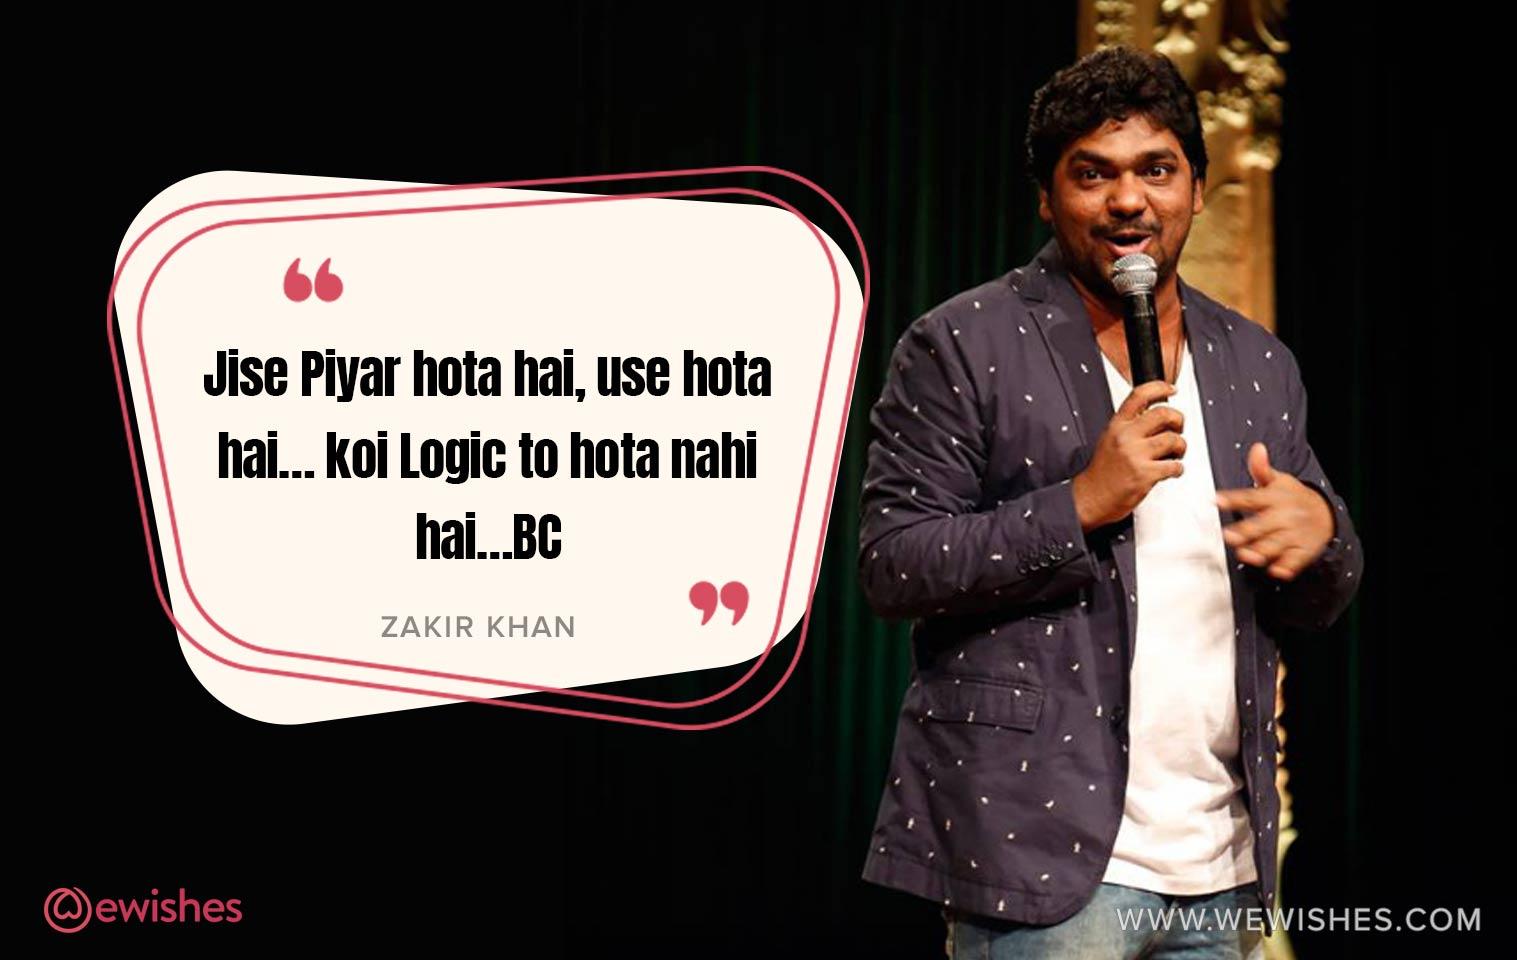 Zakir Khan Quotes on Love